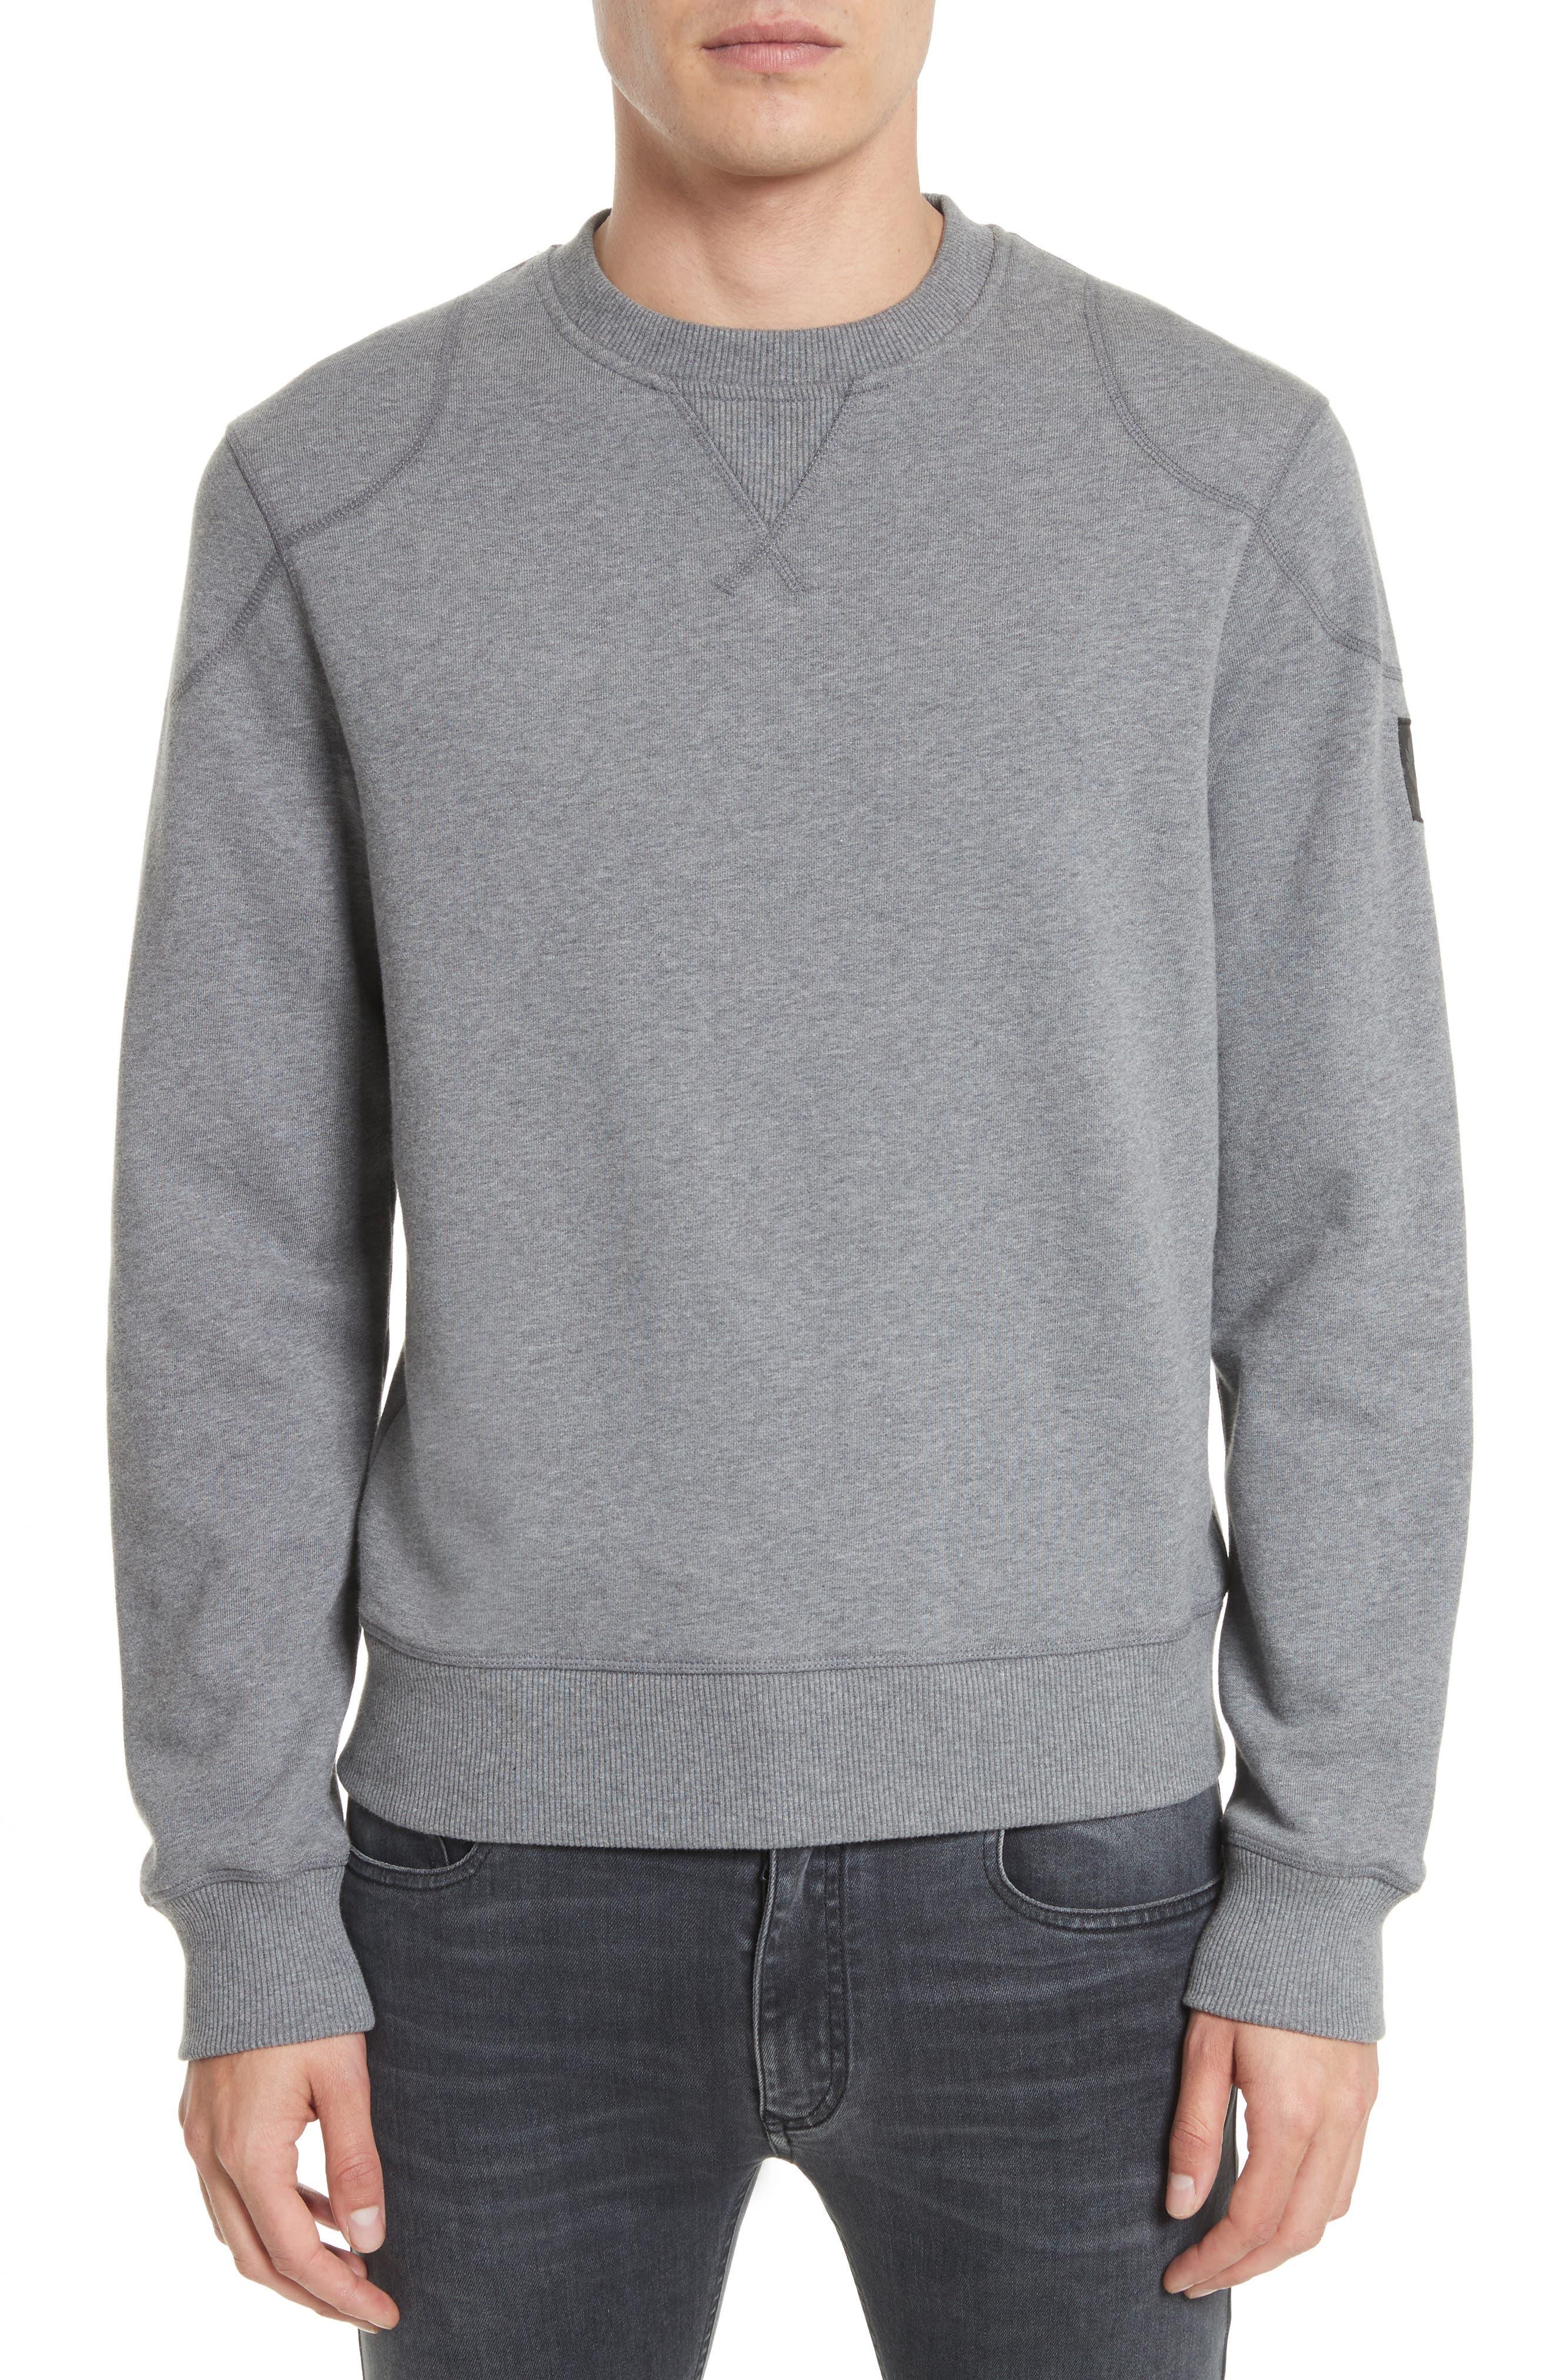 Main Image - Belstaff Jefferson Fleece Sweatshirt